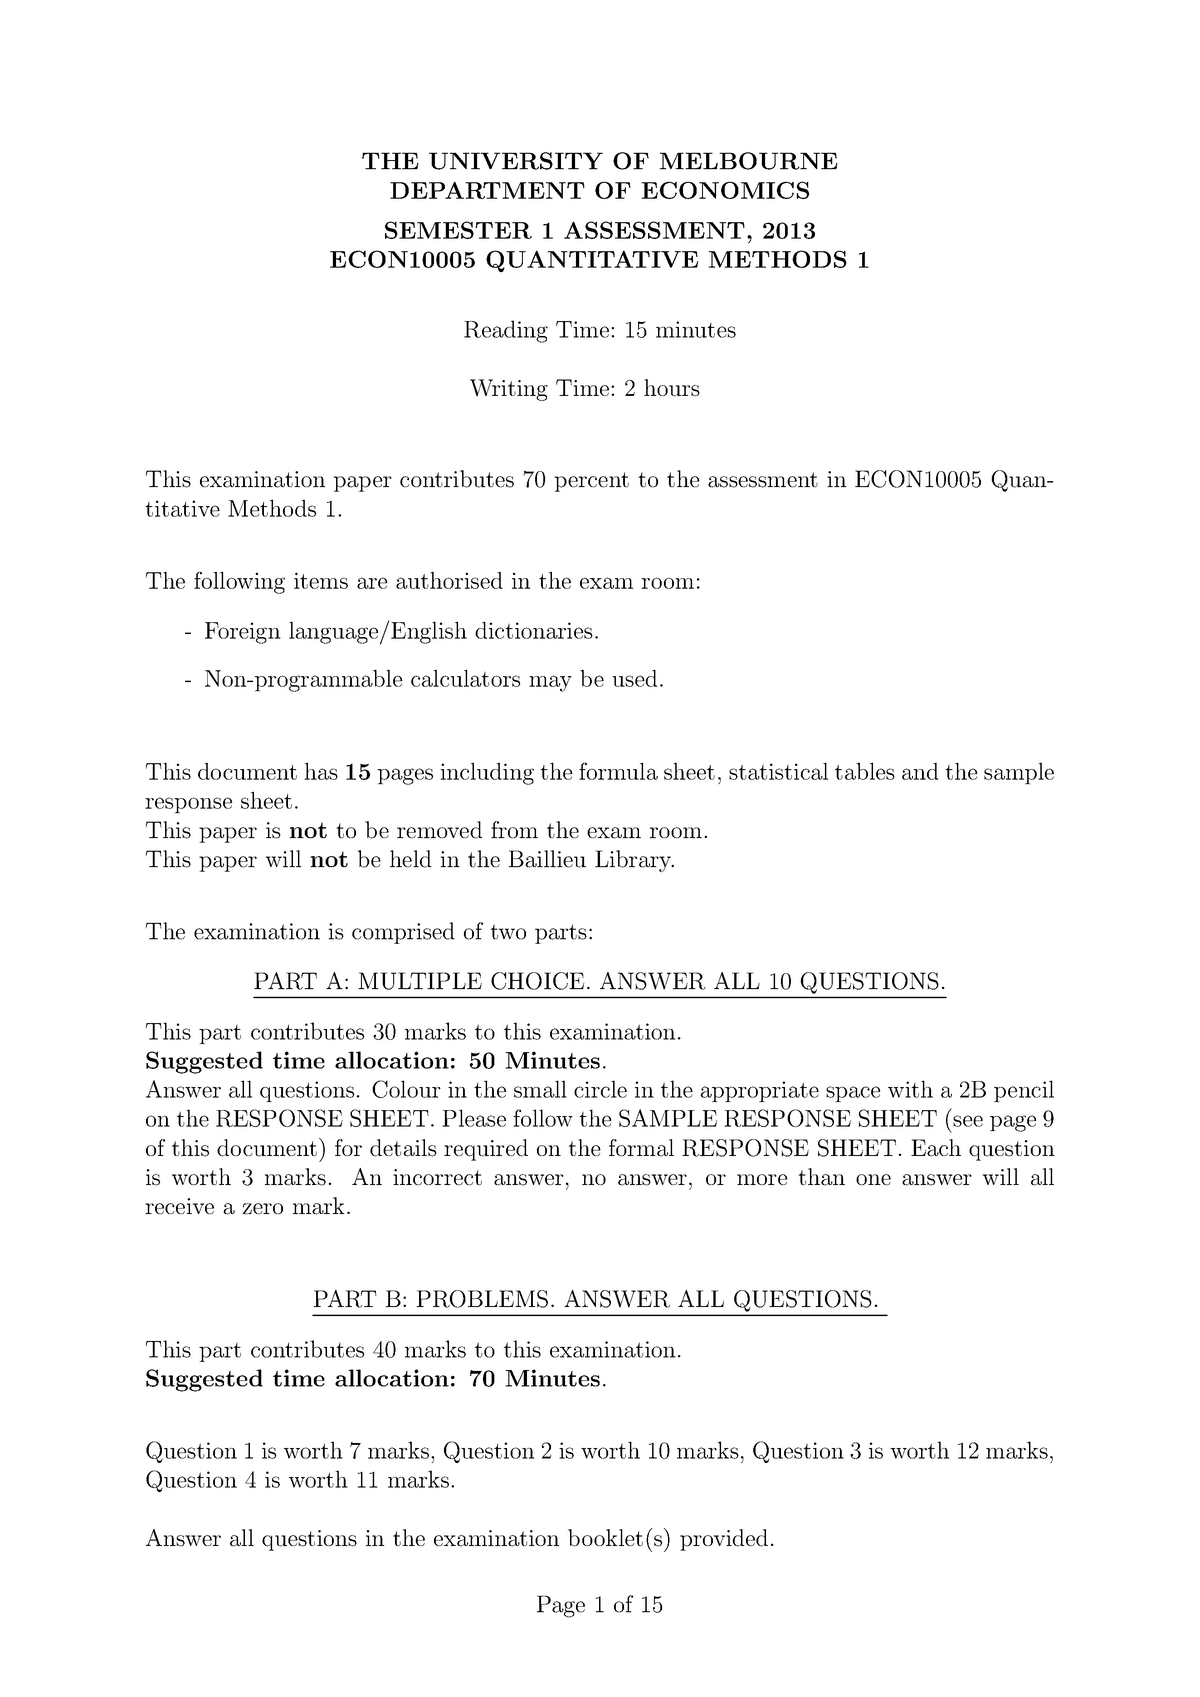 Exam Sem 1, 2013 Questions and Answers pdf - ECON10005 - StuDocu